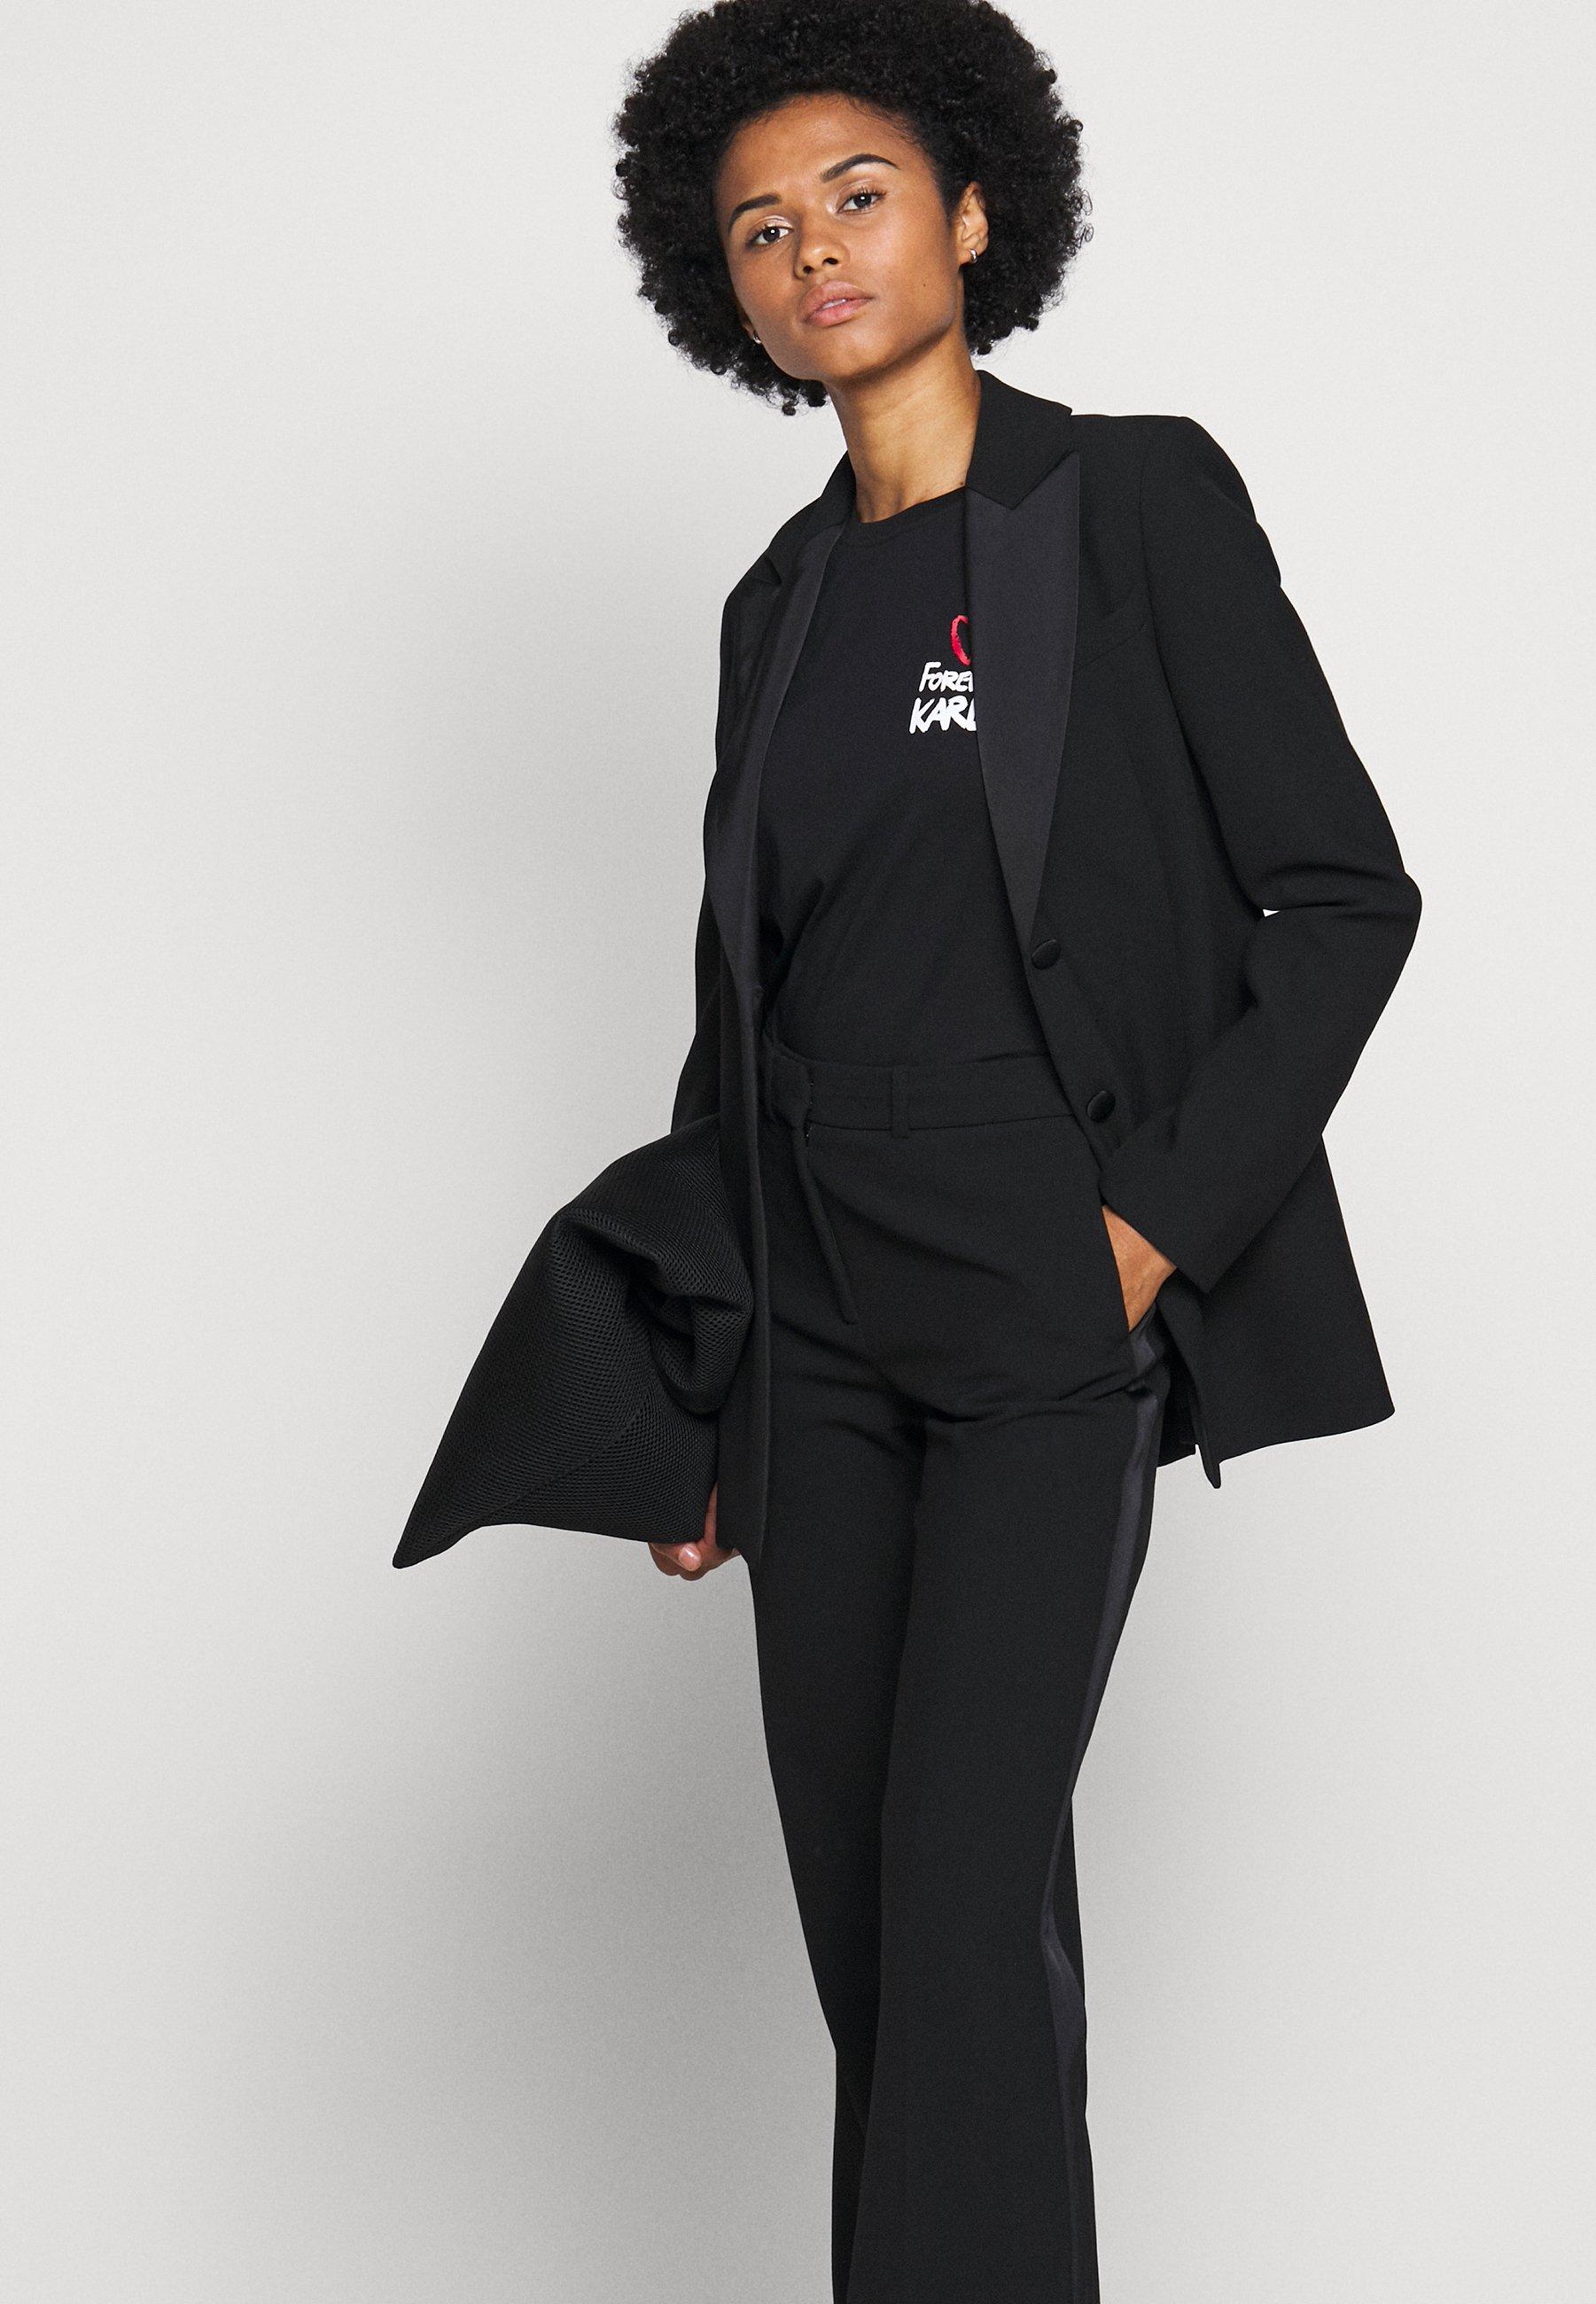 Aaa Quality Women's Clothing KARL LAGERFELD FOREVER Print T-shirt black UYUfUPRxH